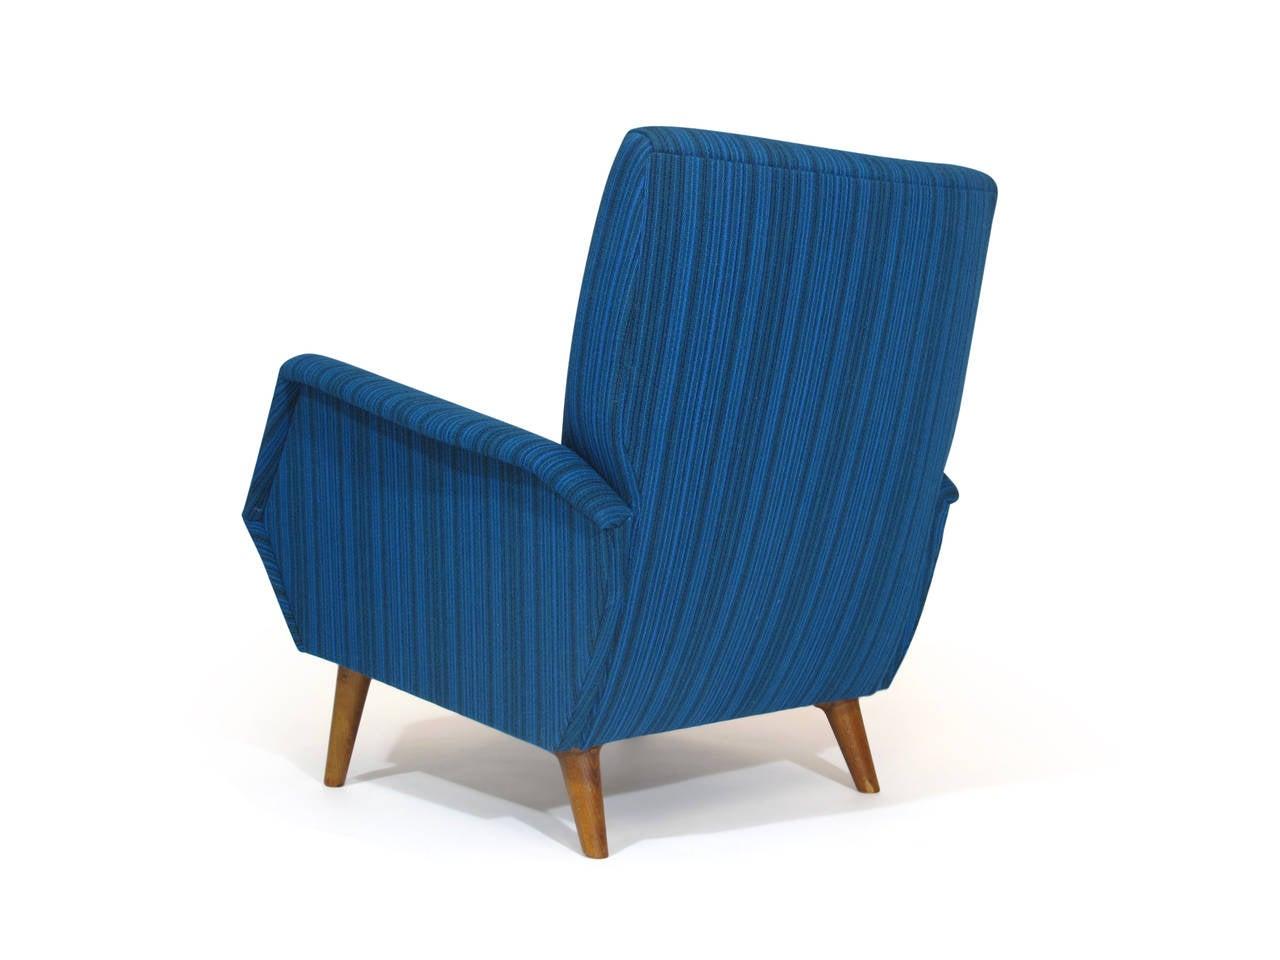 Oiled Gio Ponti Model 803 Mid-Century Italian Lounge Chair For Sale